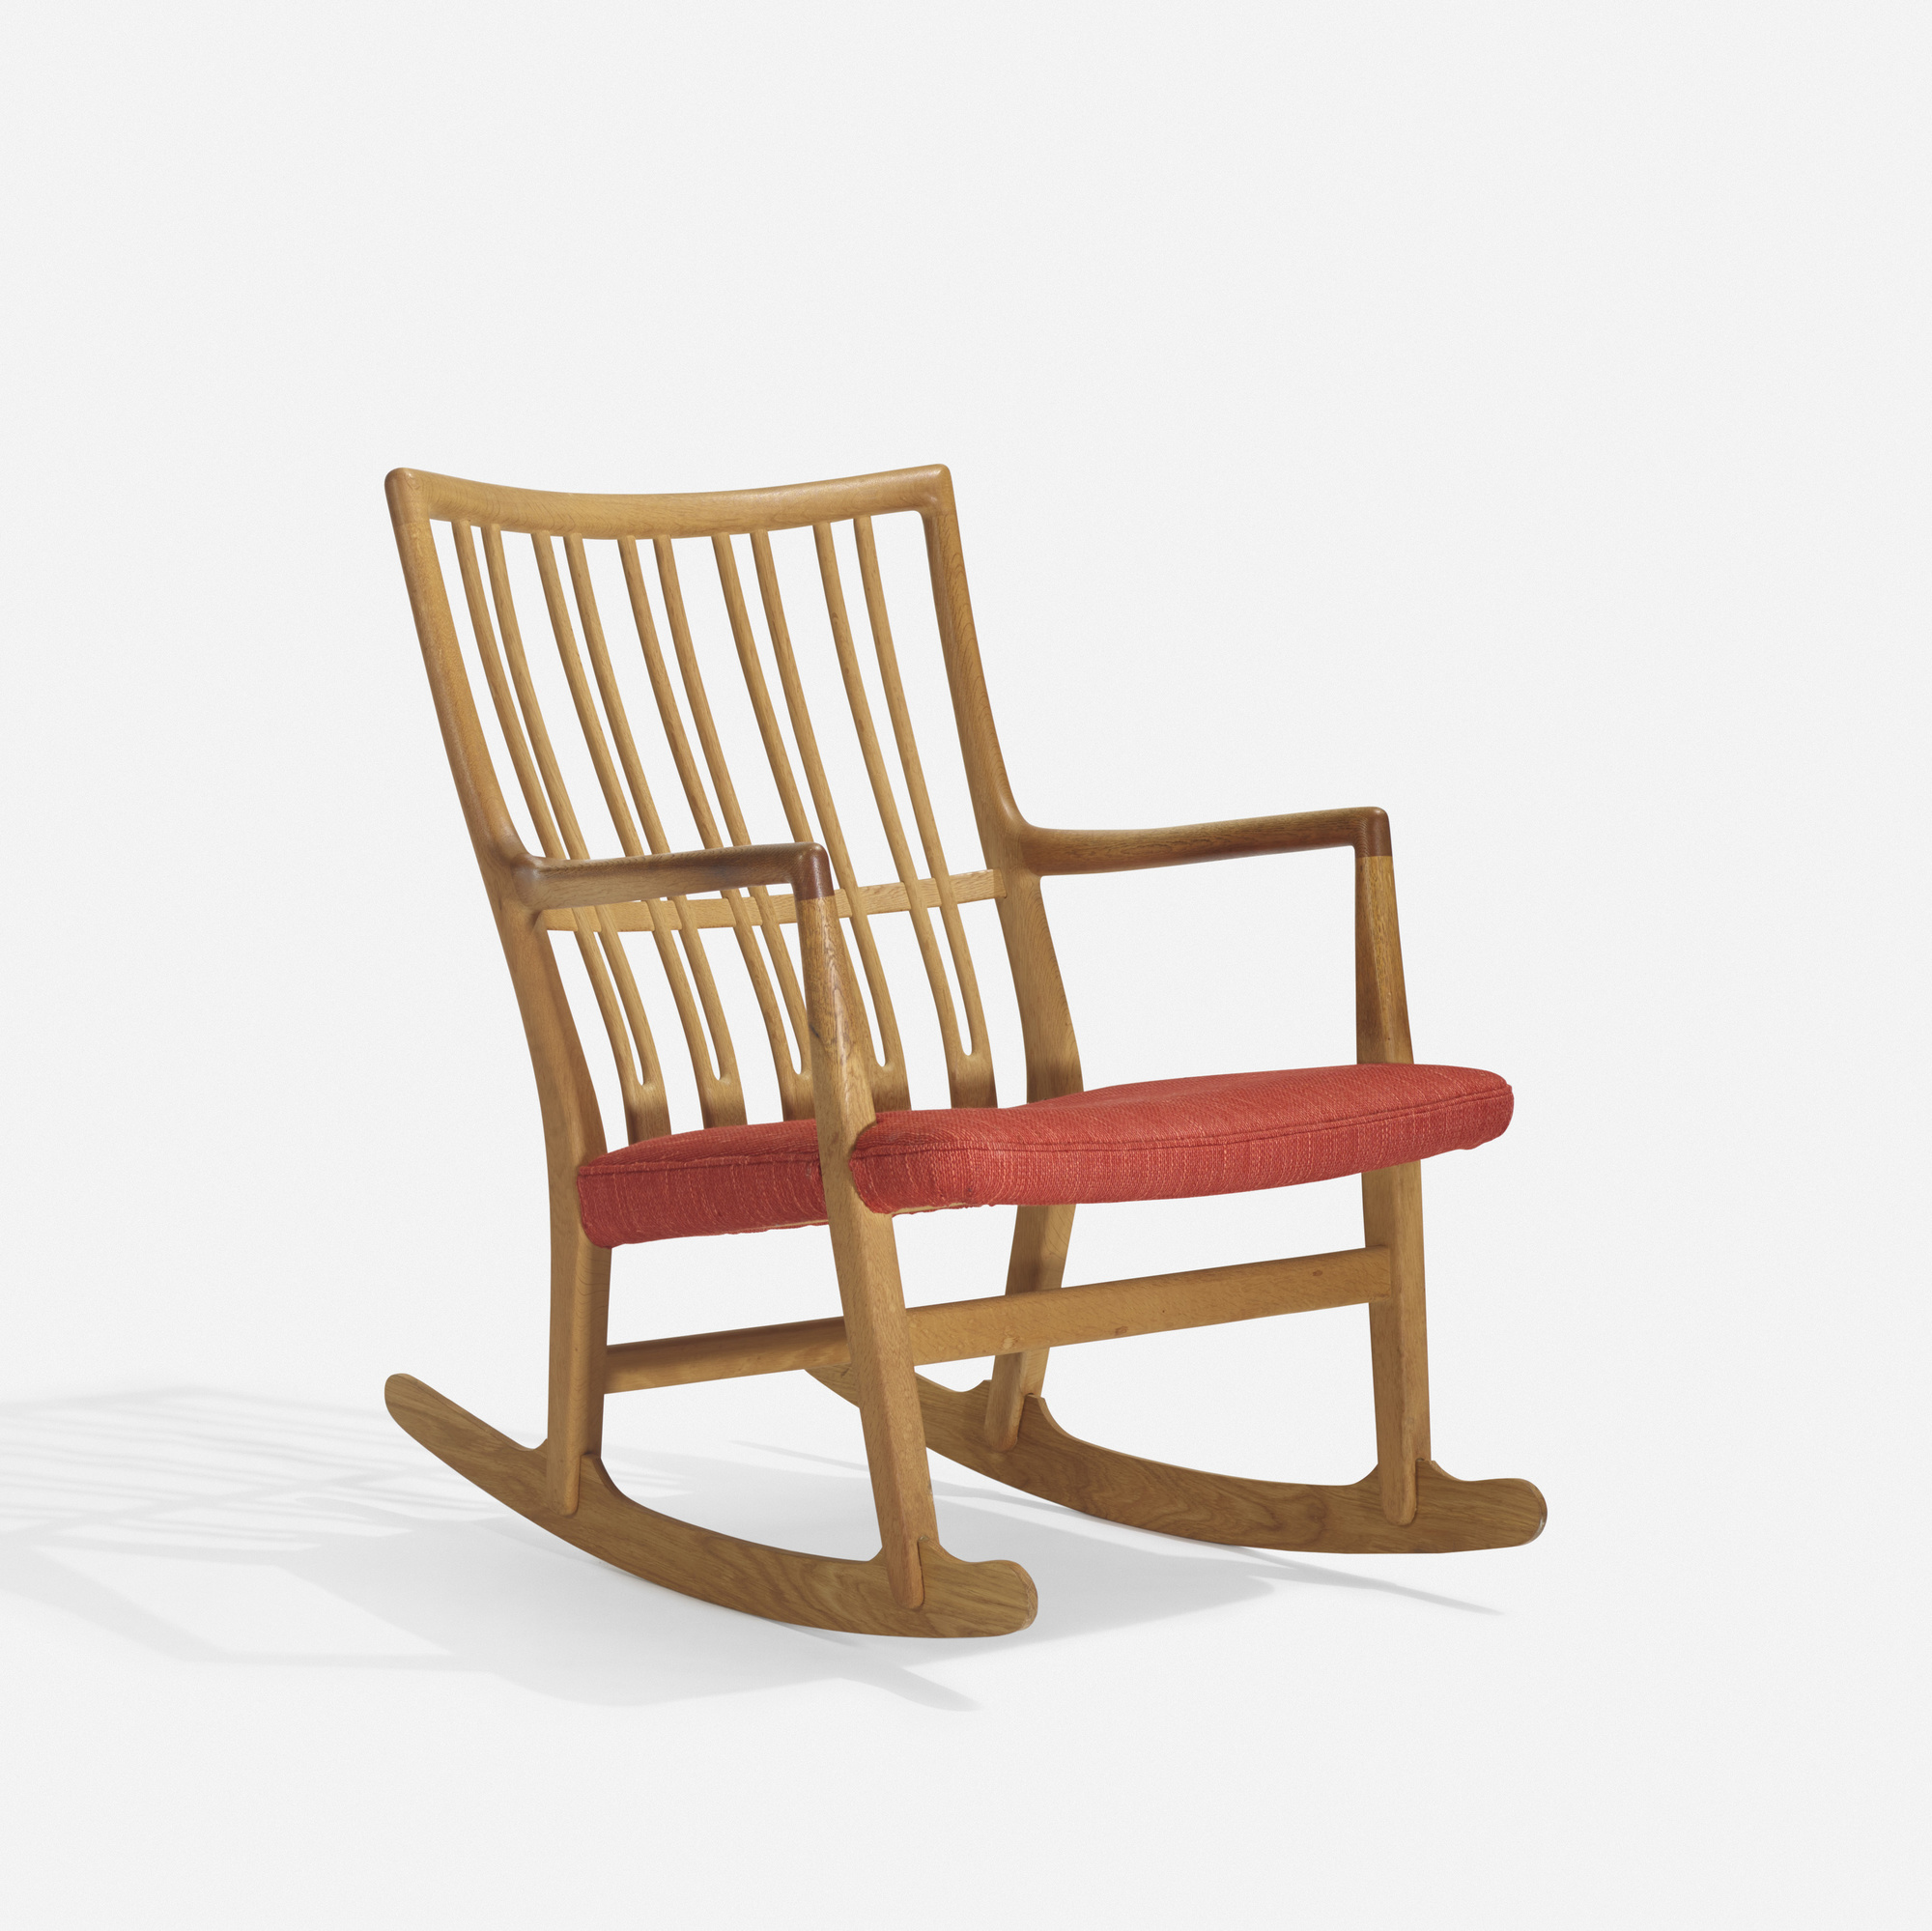 hans wegner rocking chair platform chairs 244 j scandinavian design 3 november 1 of 2